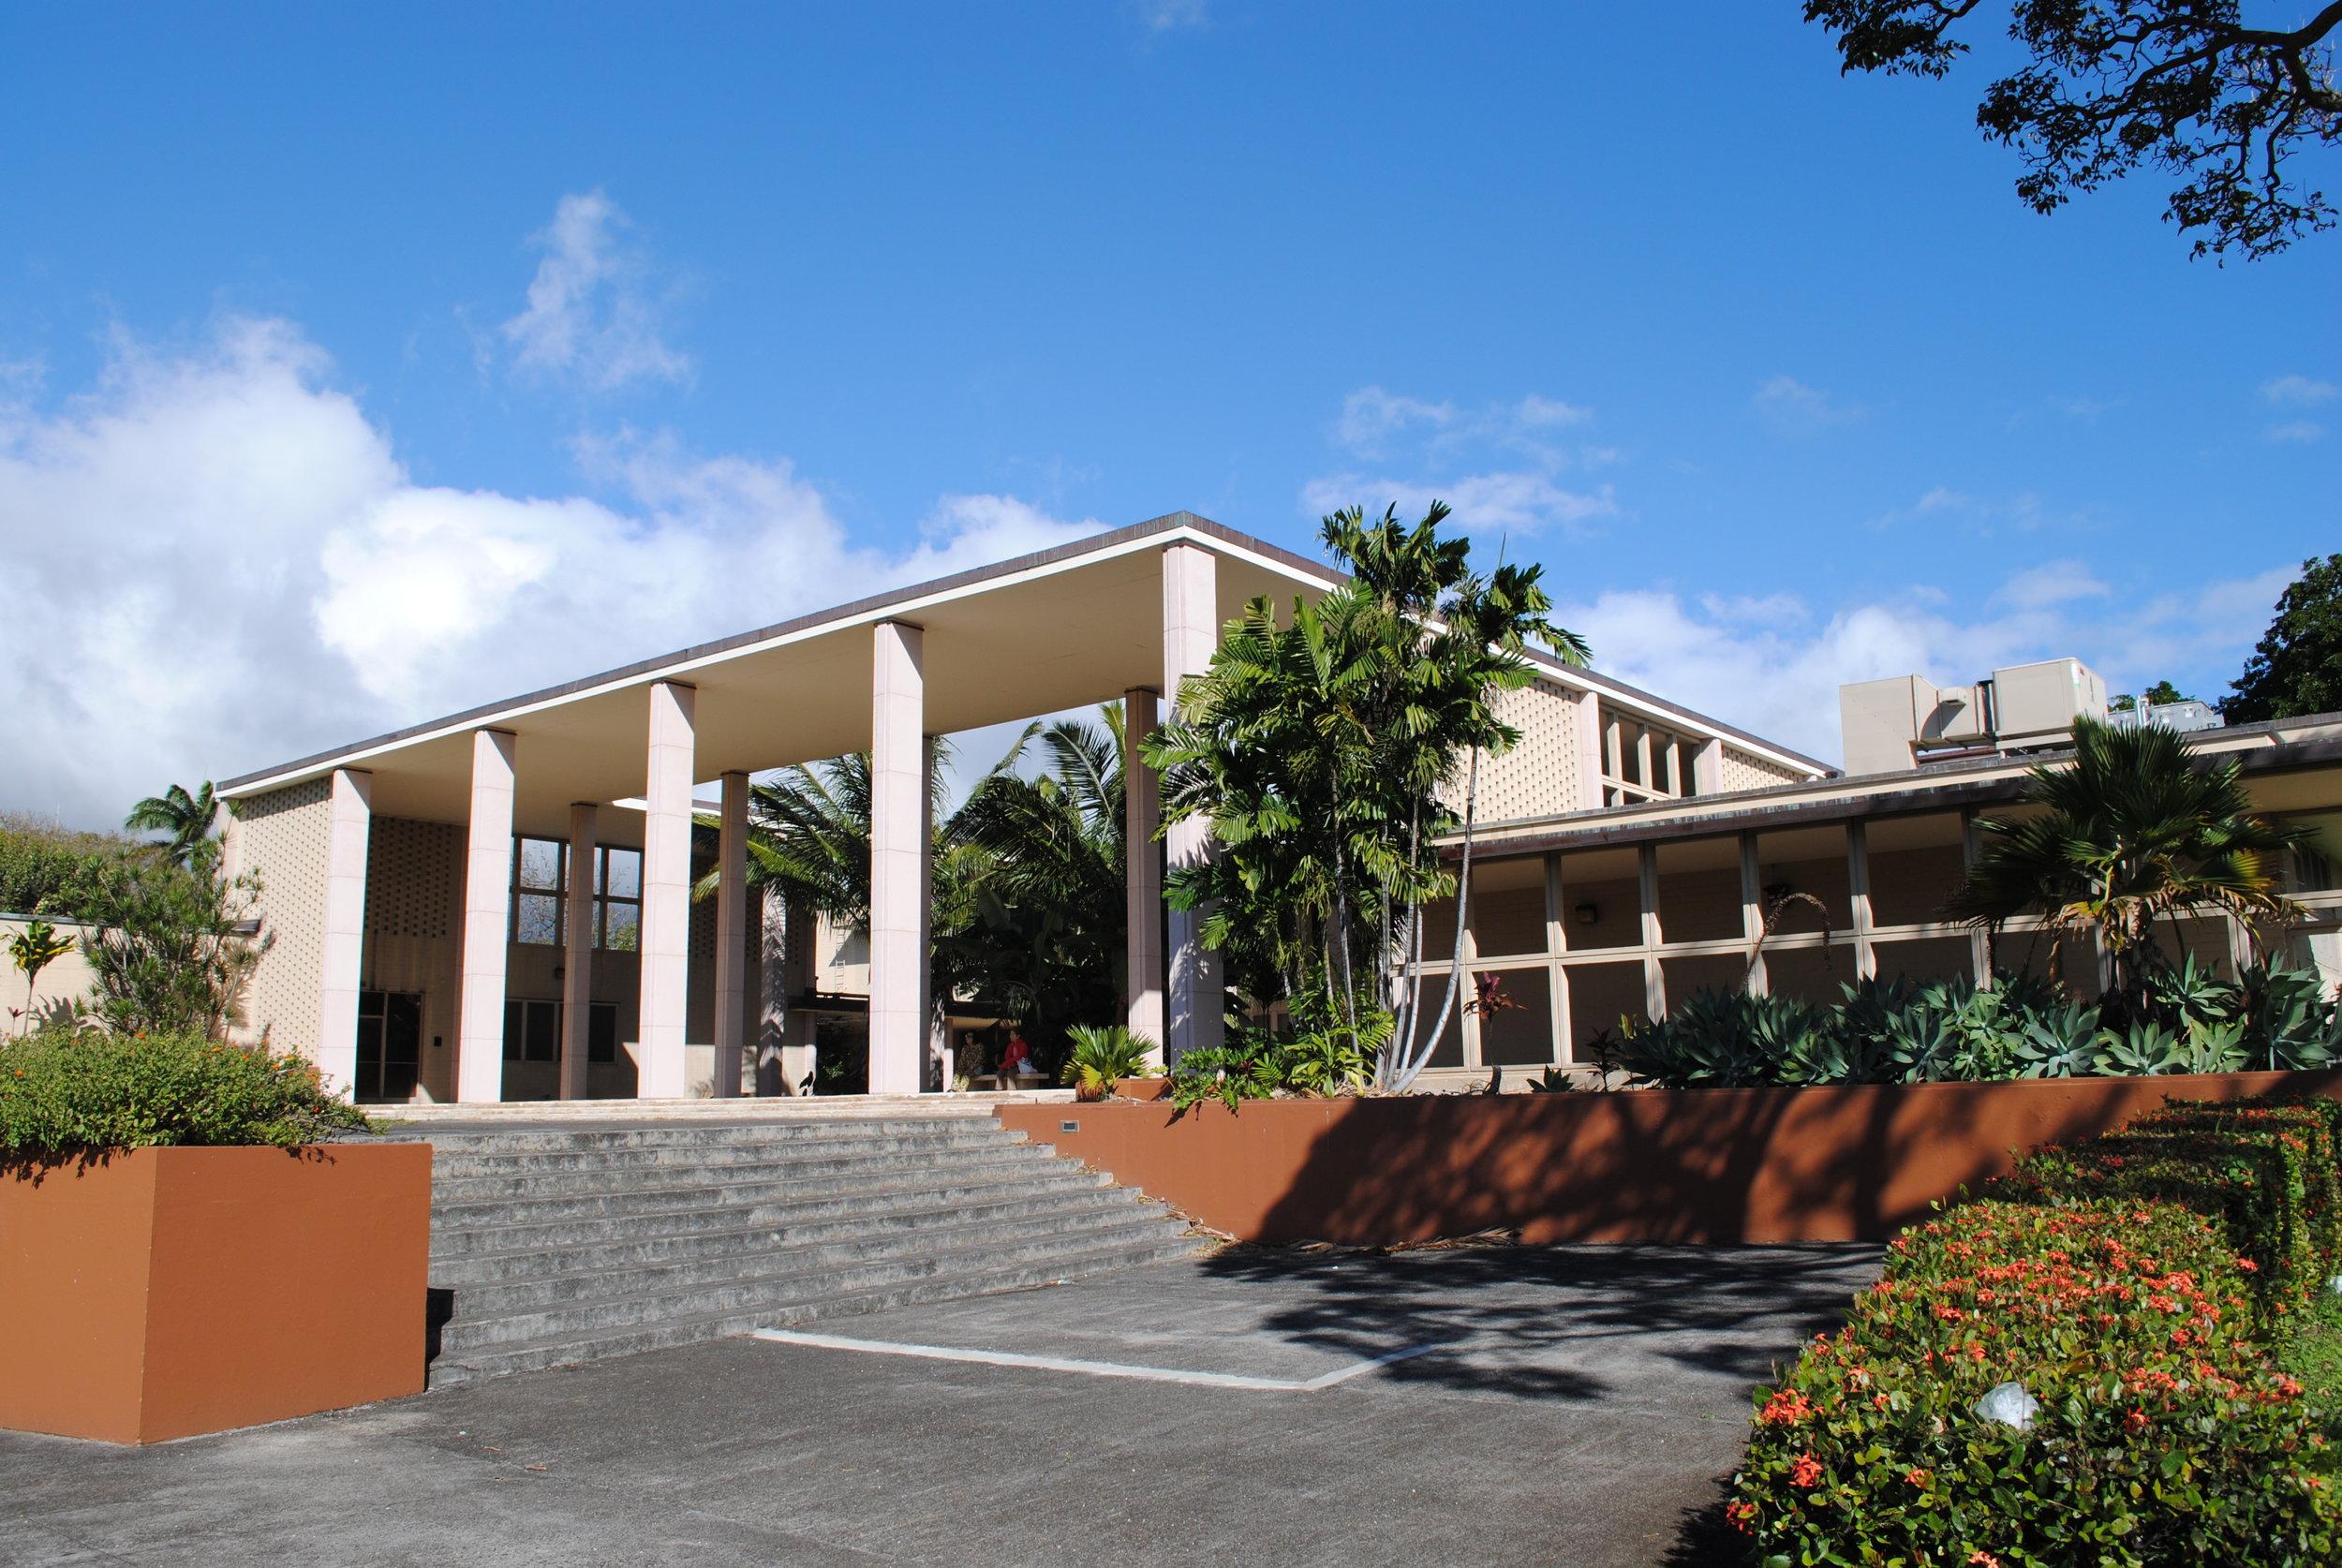 Photograph by Historic Hawai'i Foundation.